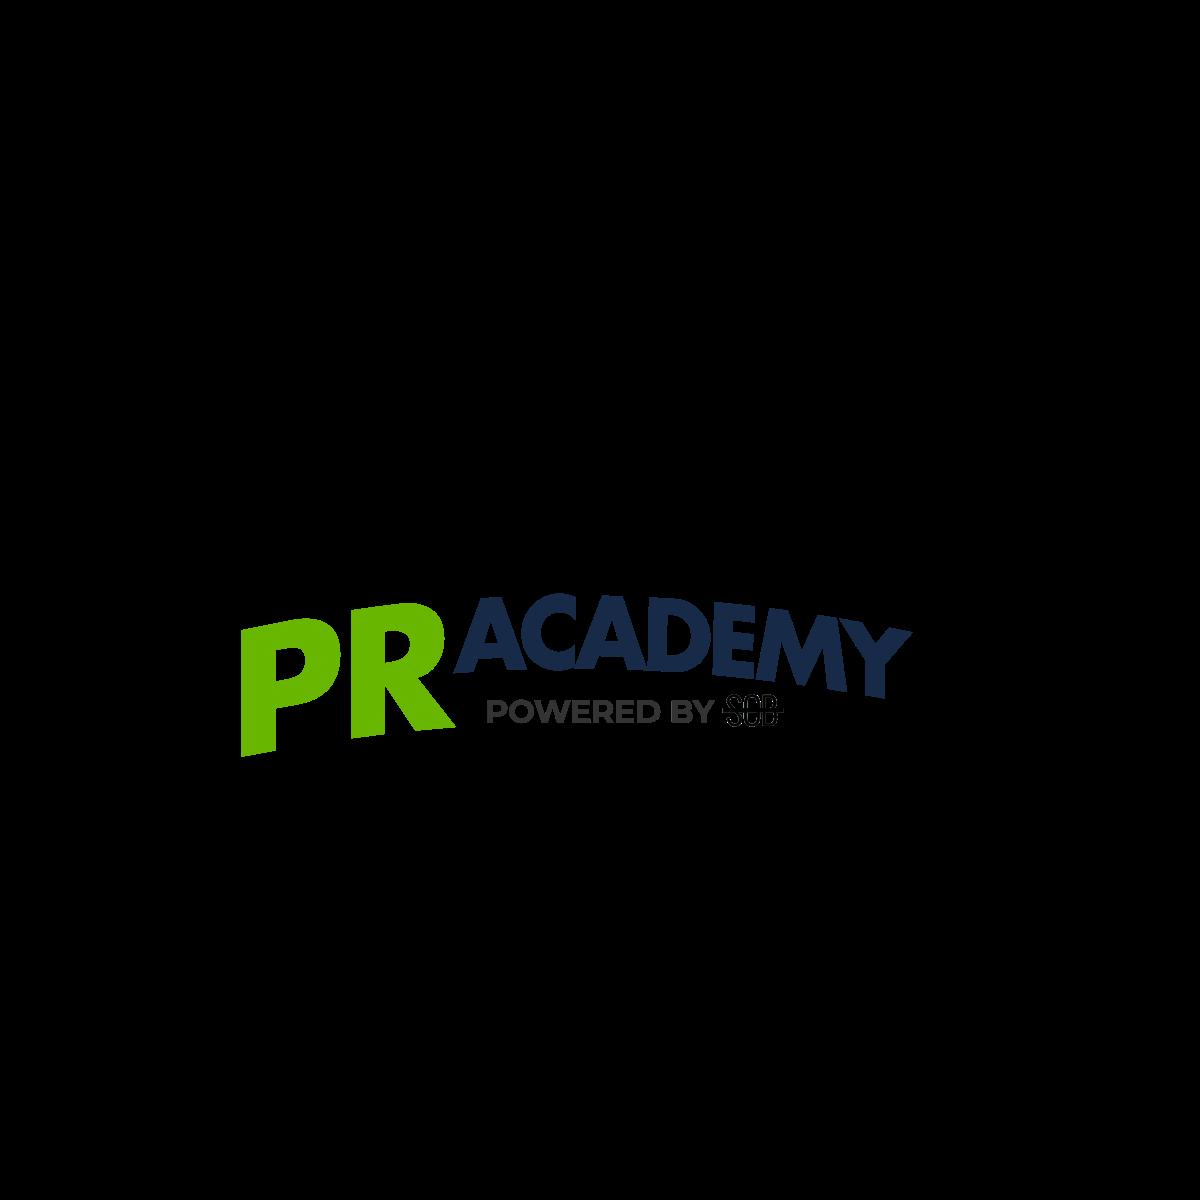 Keetria's PR Academy